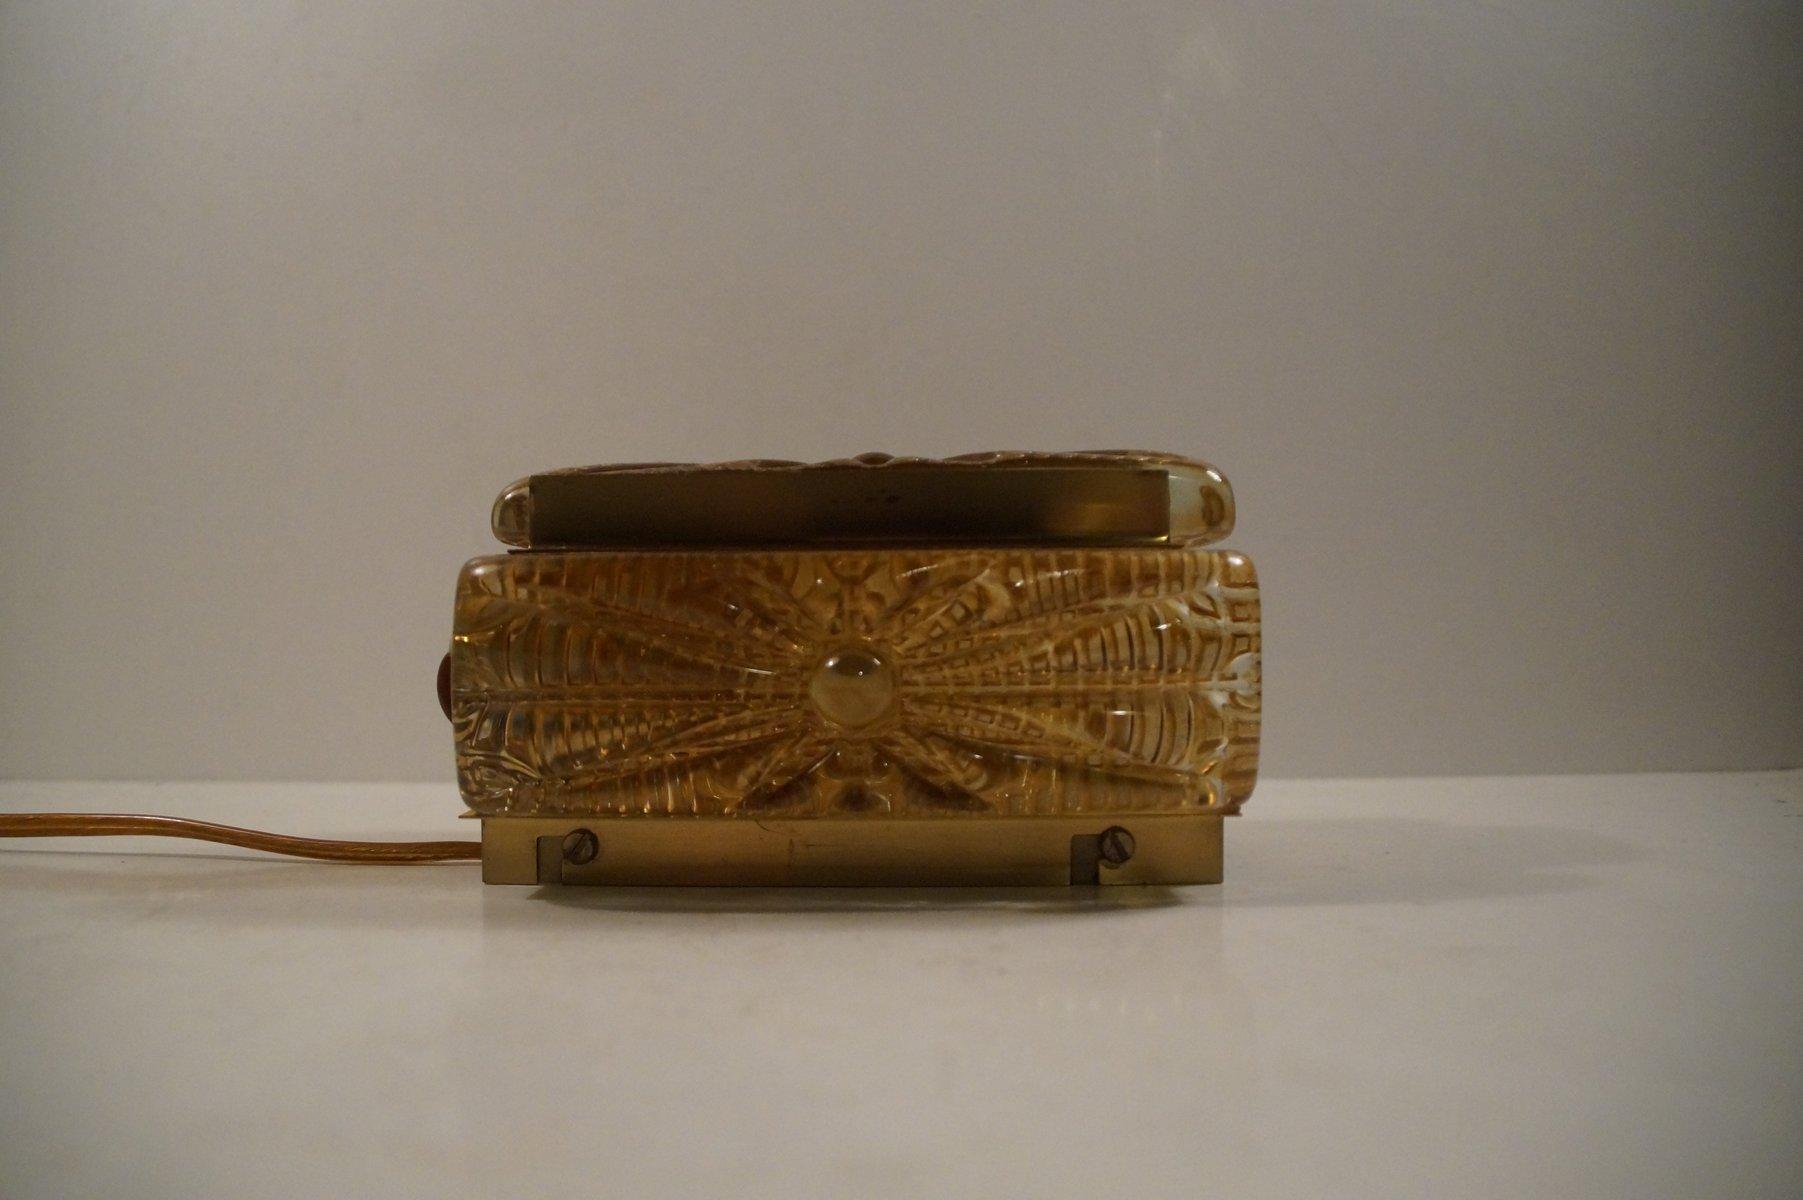 Aladdin Amber Glass U0026 Brass Wall Sconce From Vitrika, 1960s For Sale At  Pamono